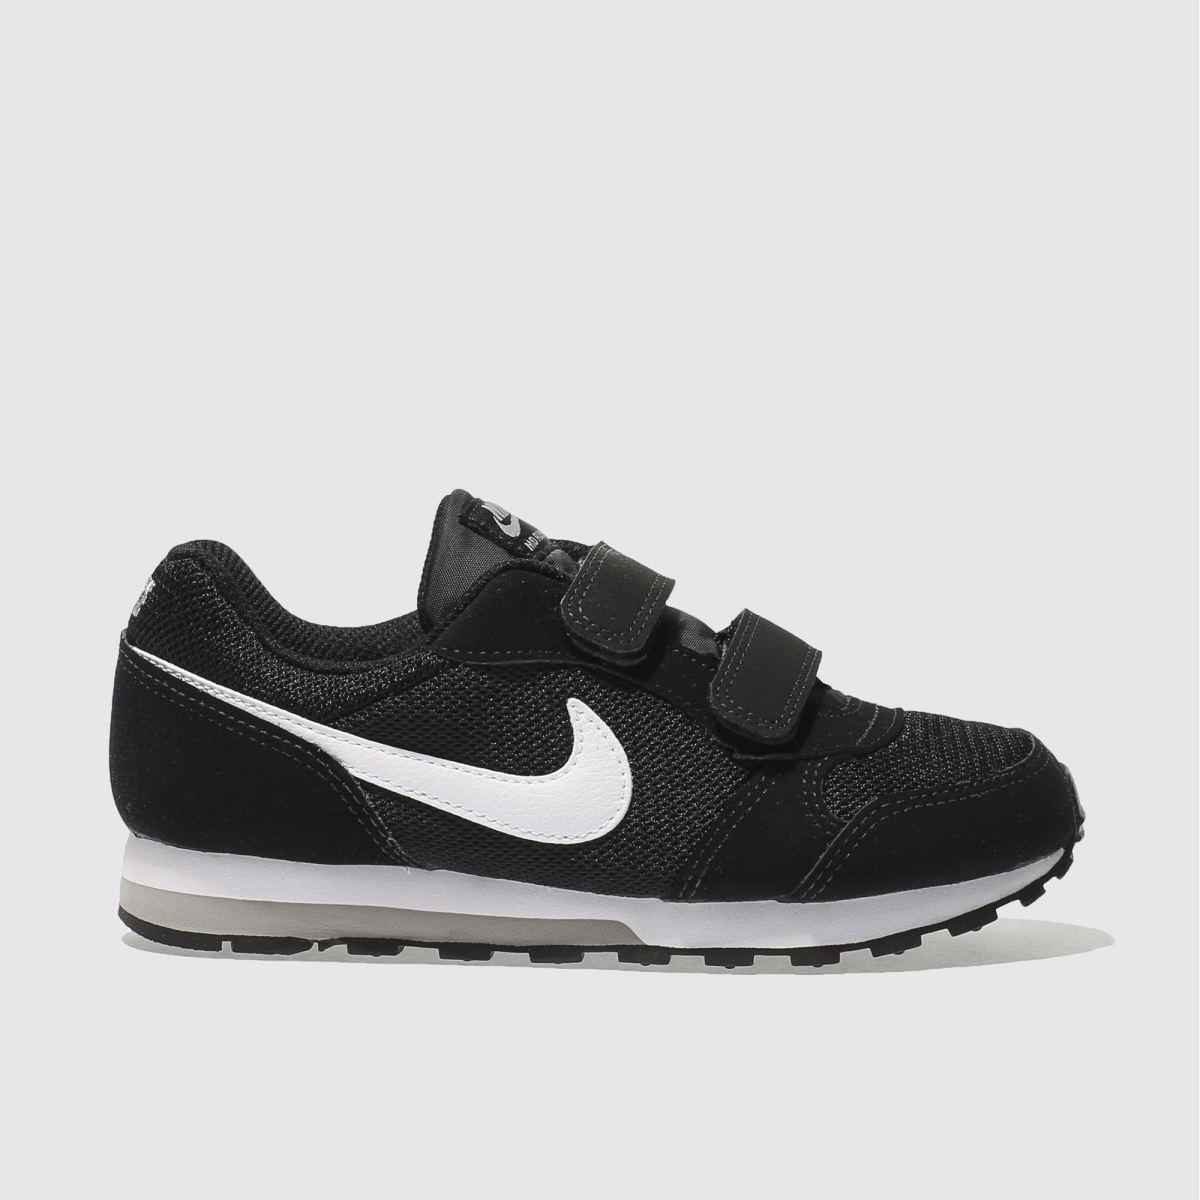 Nike Black & White Md Runner 2 Trainers Junior